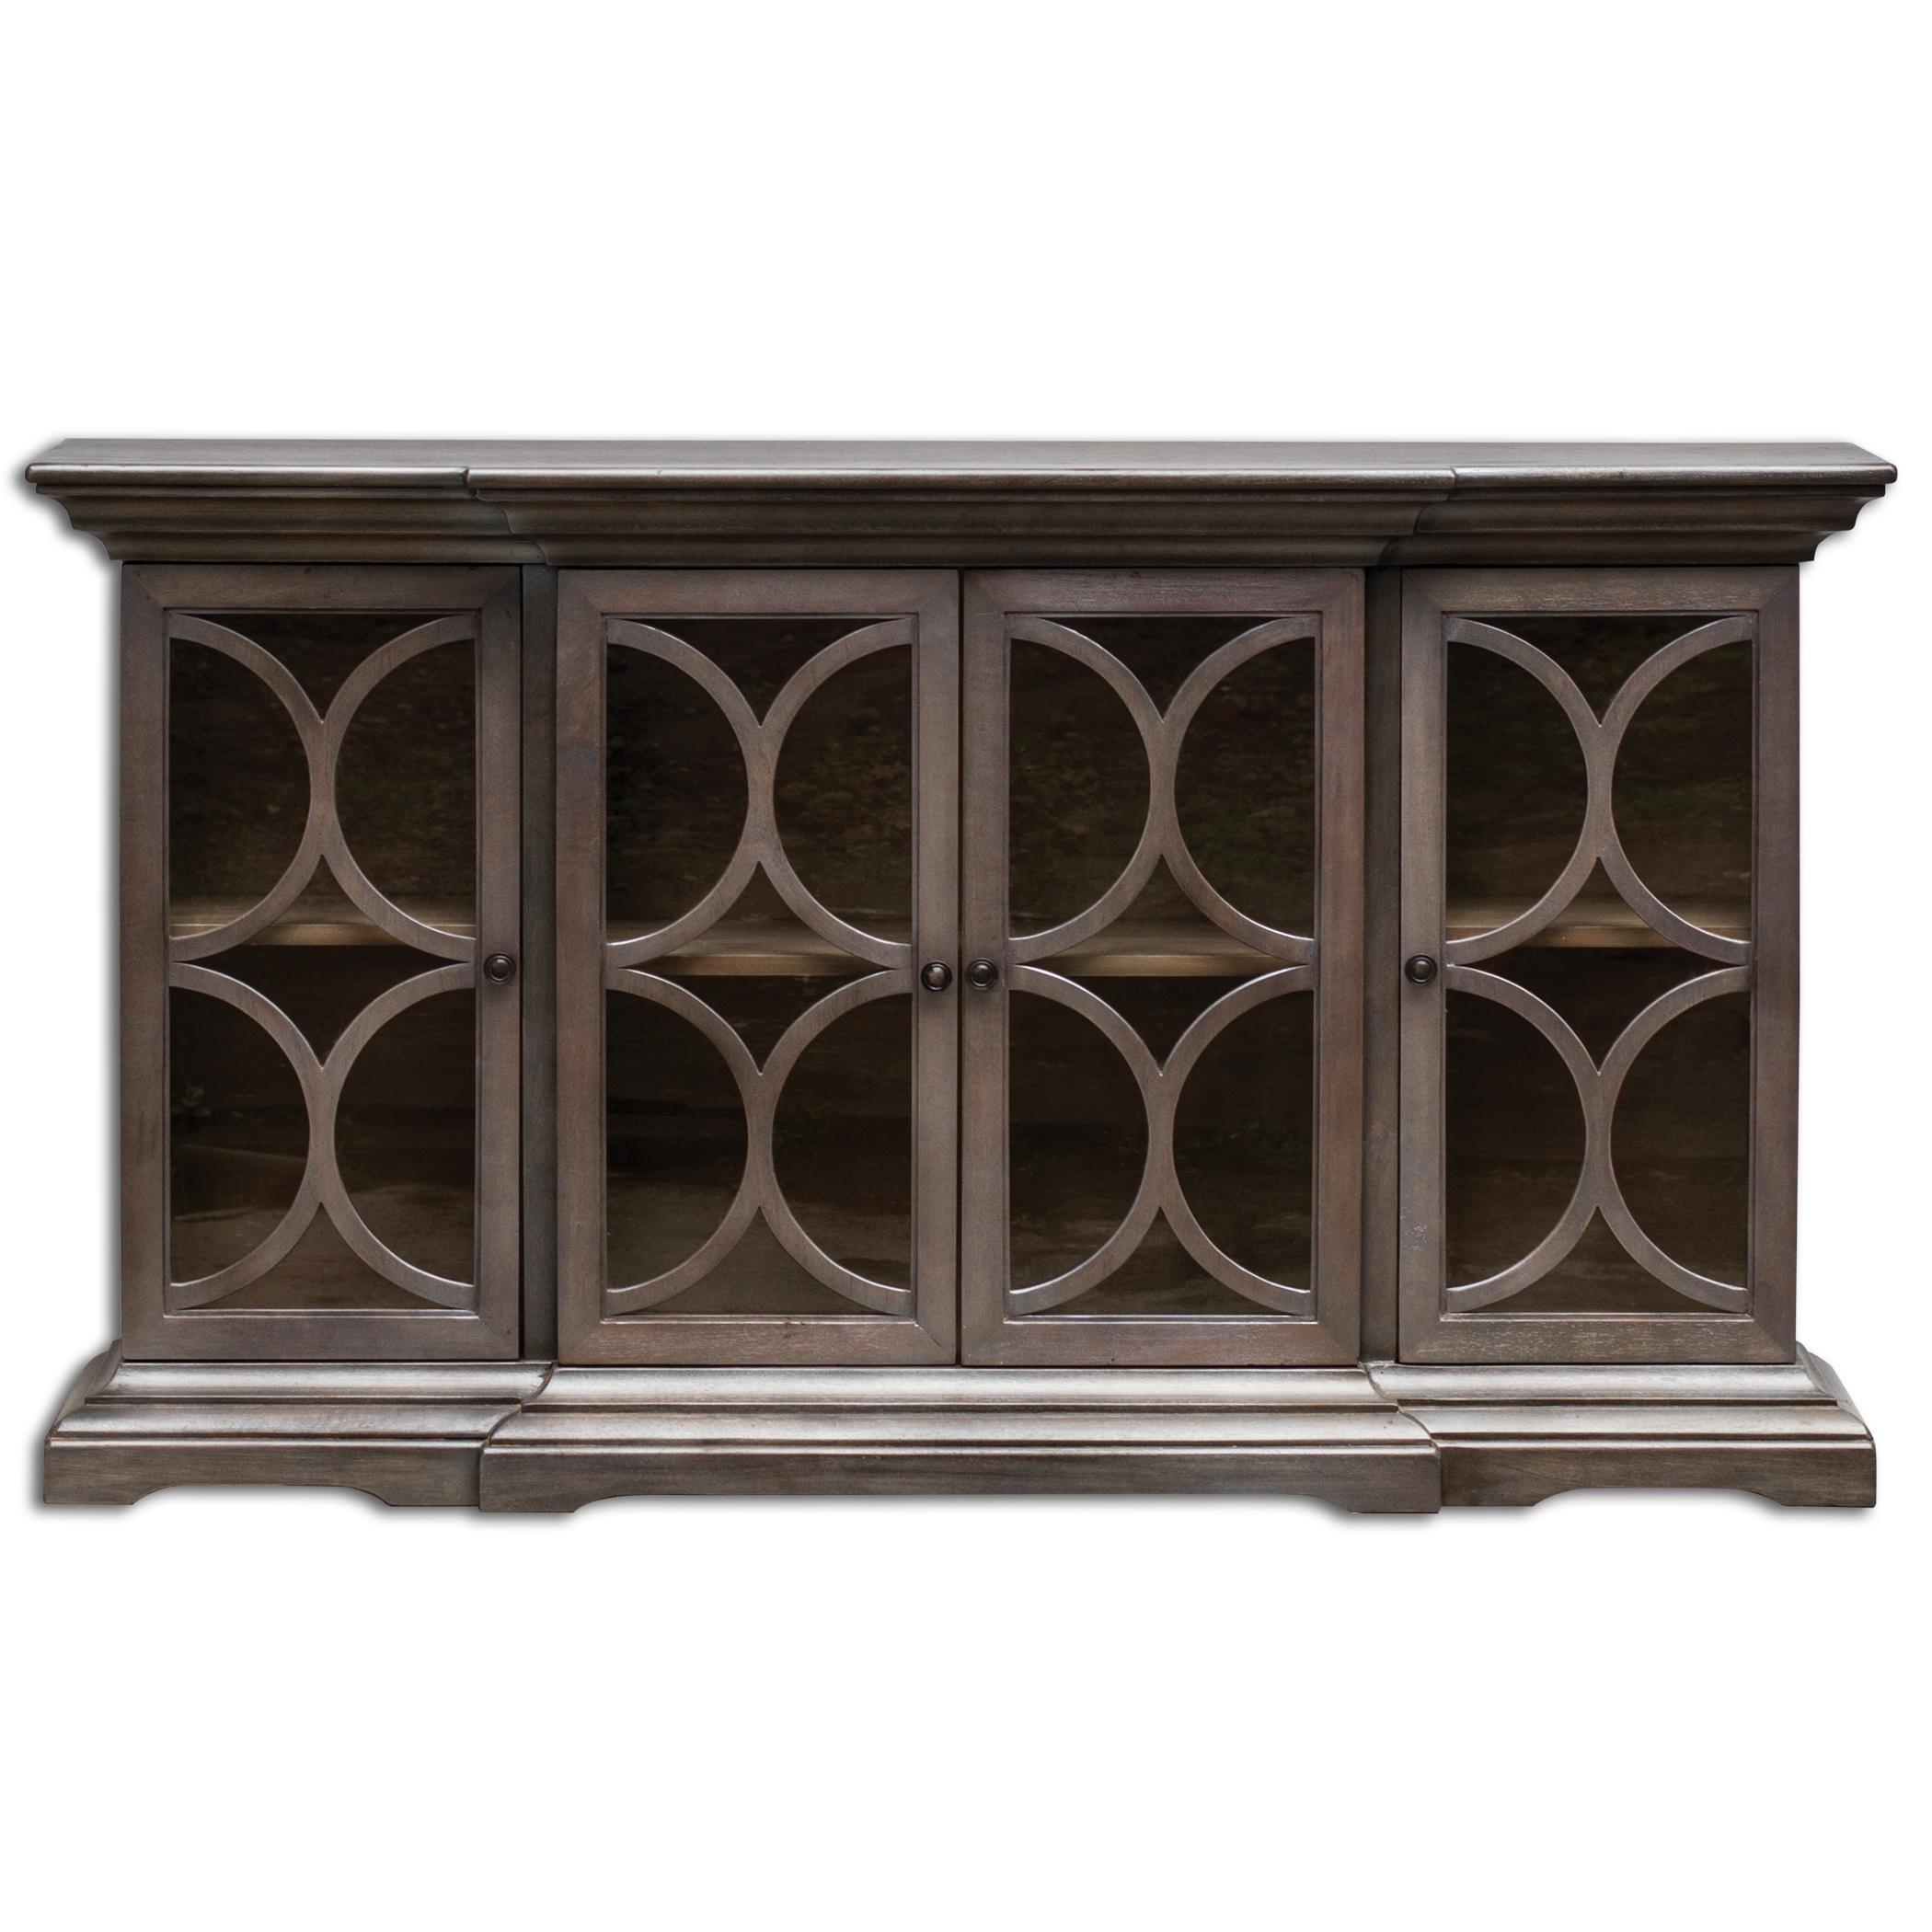 Uttermost Accent Furniture Belino Wooden 4 Door Chest